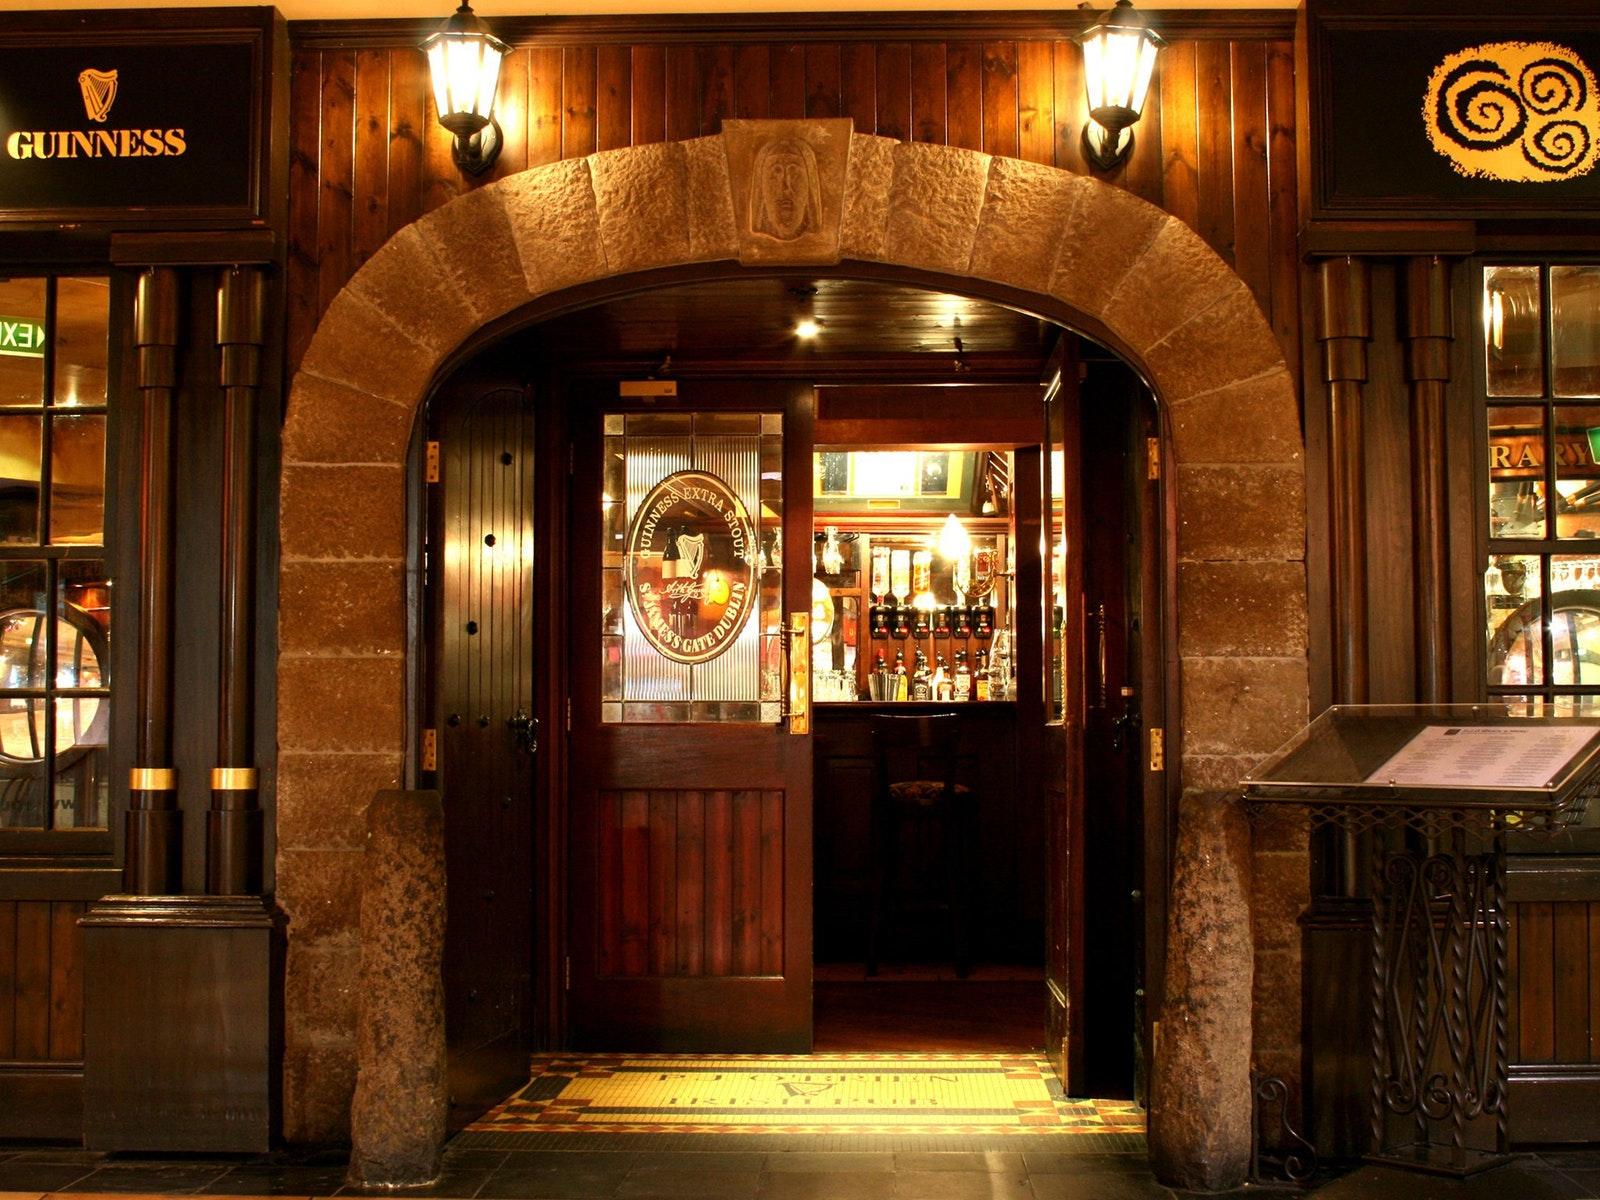 P.J.O'Brien's Irish Pub, Southgate